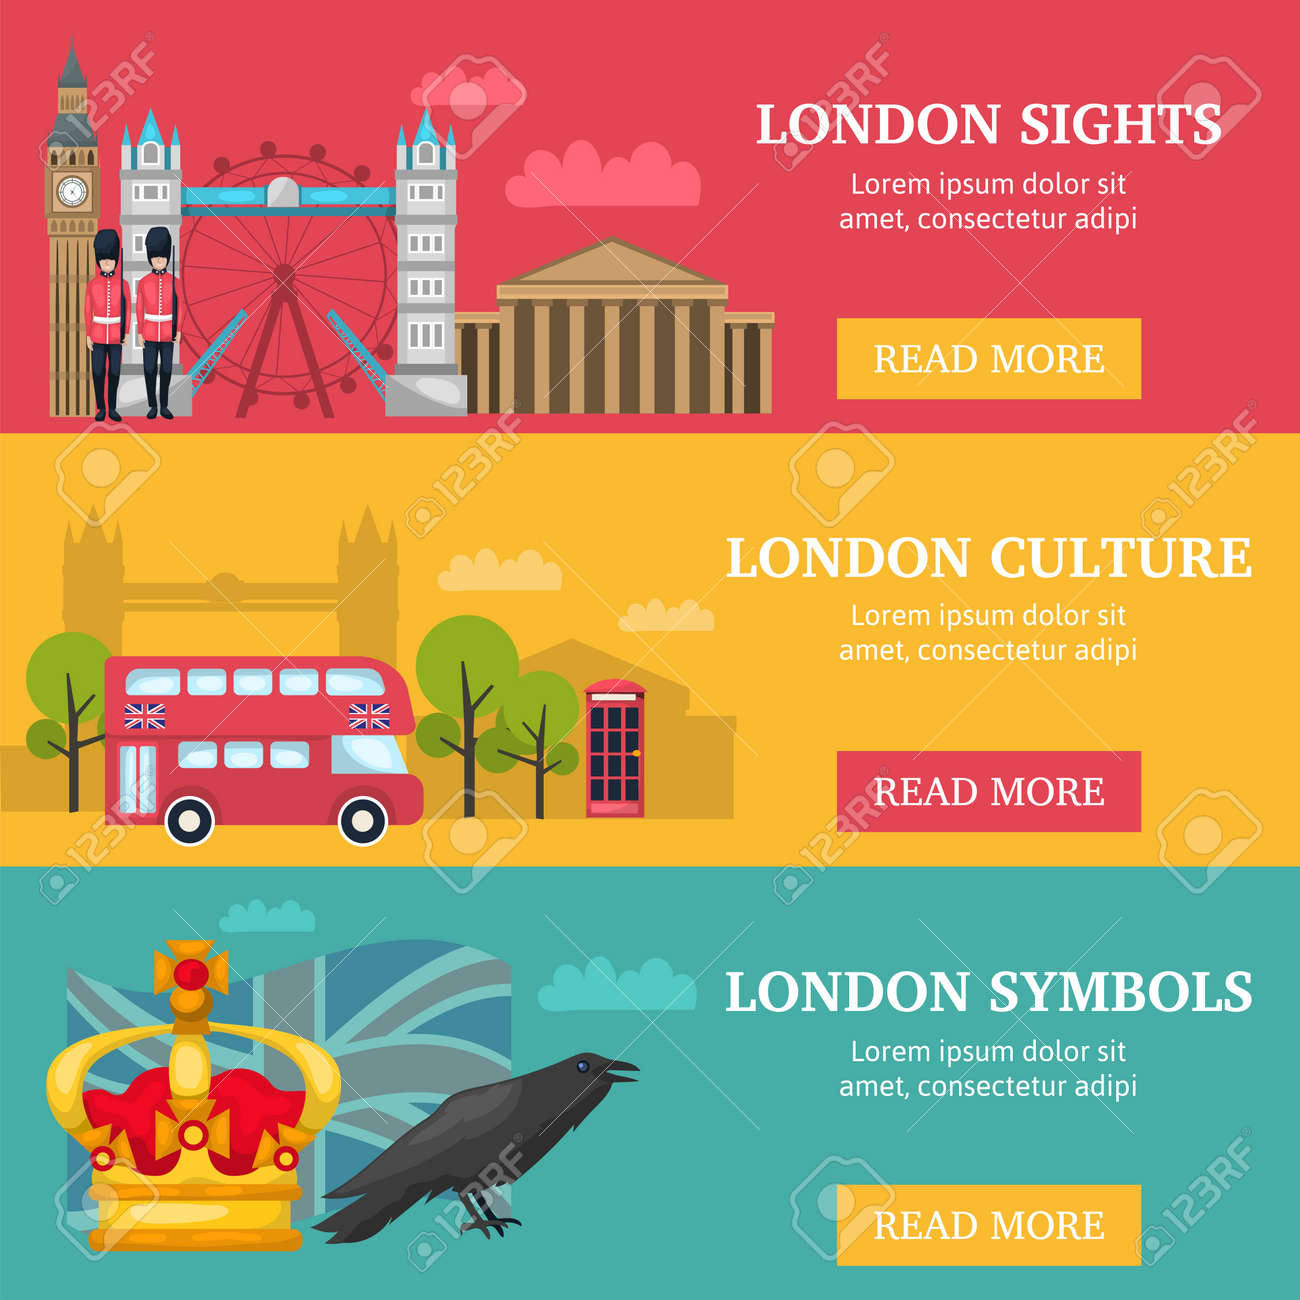 Three horizontal london banner set with London sights culture and symbols descriptions vector illustration - 166477053